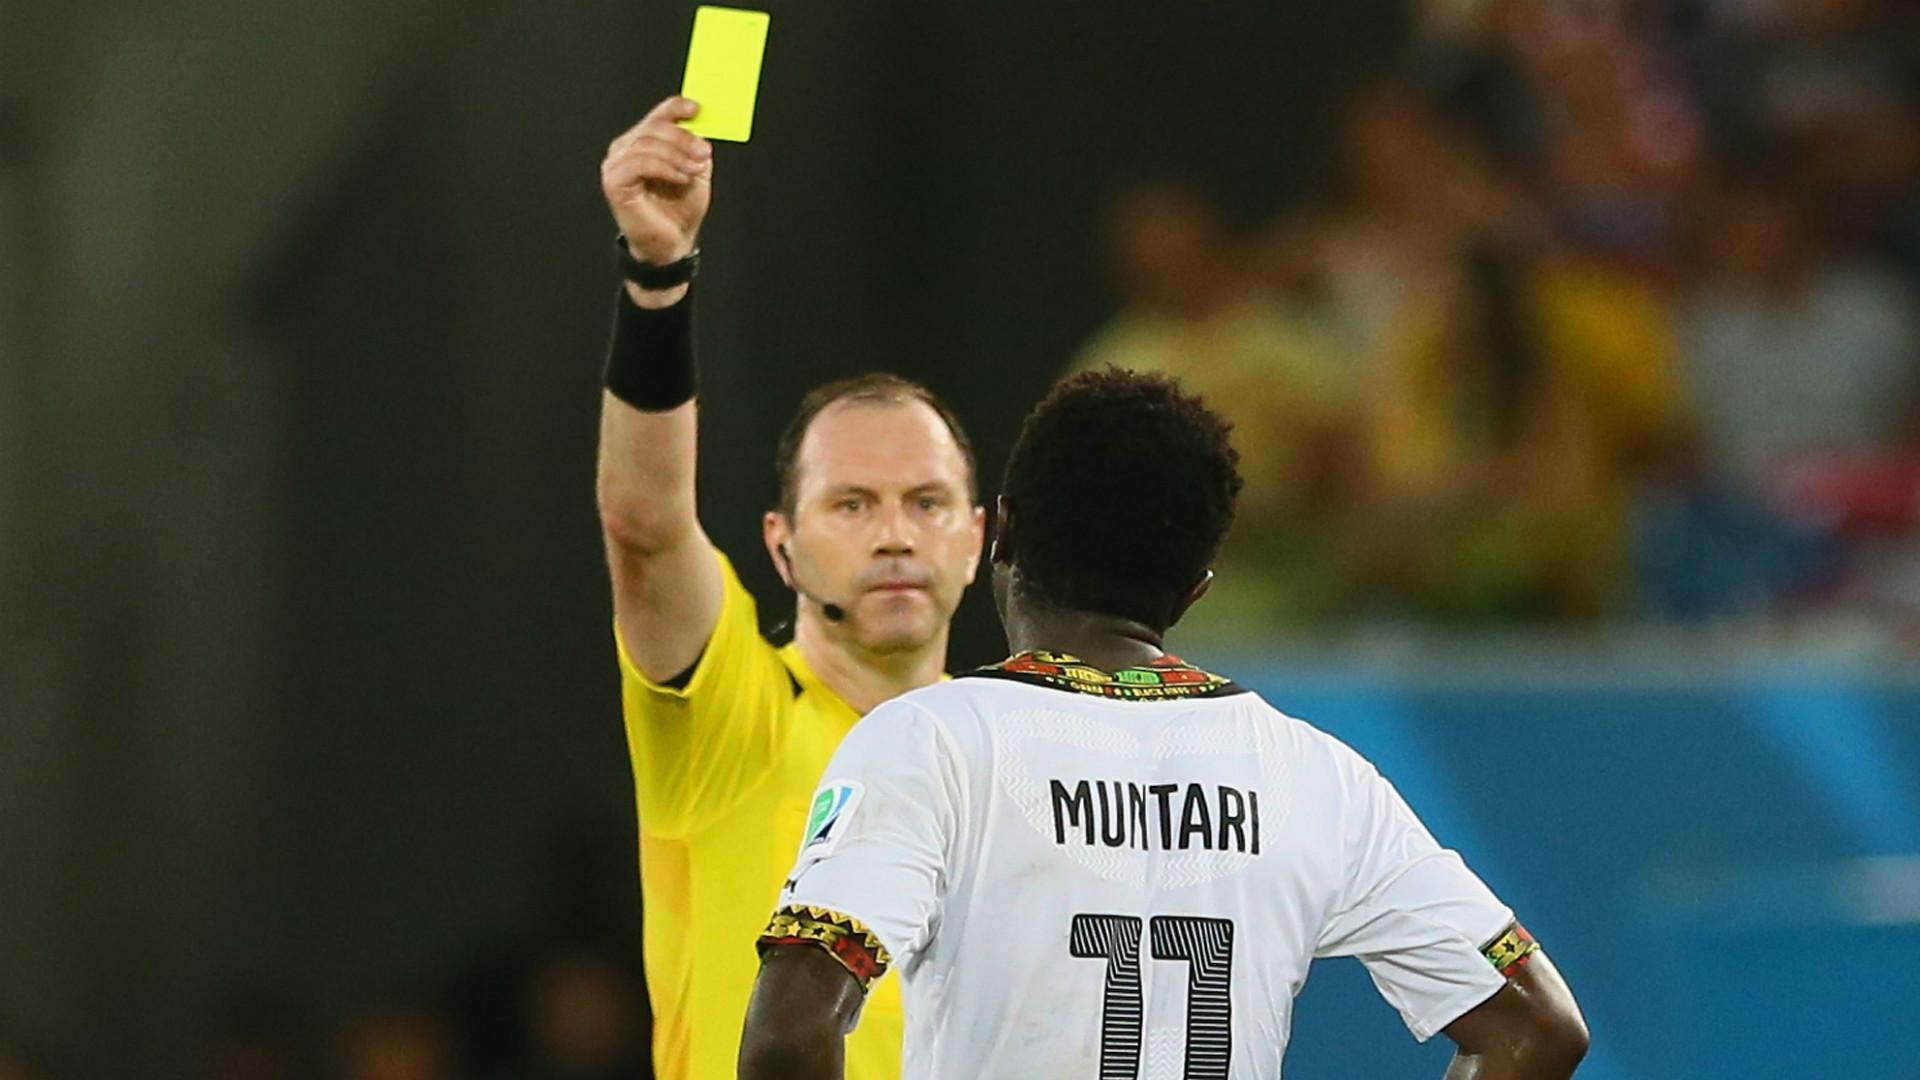 Sulley Muntari FIFA World Cup 2014